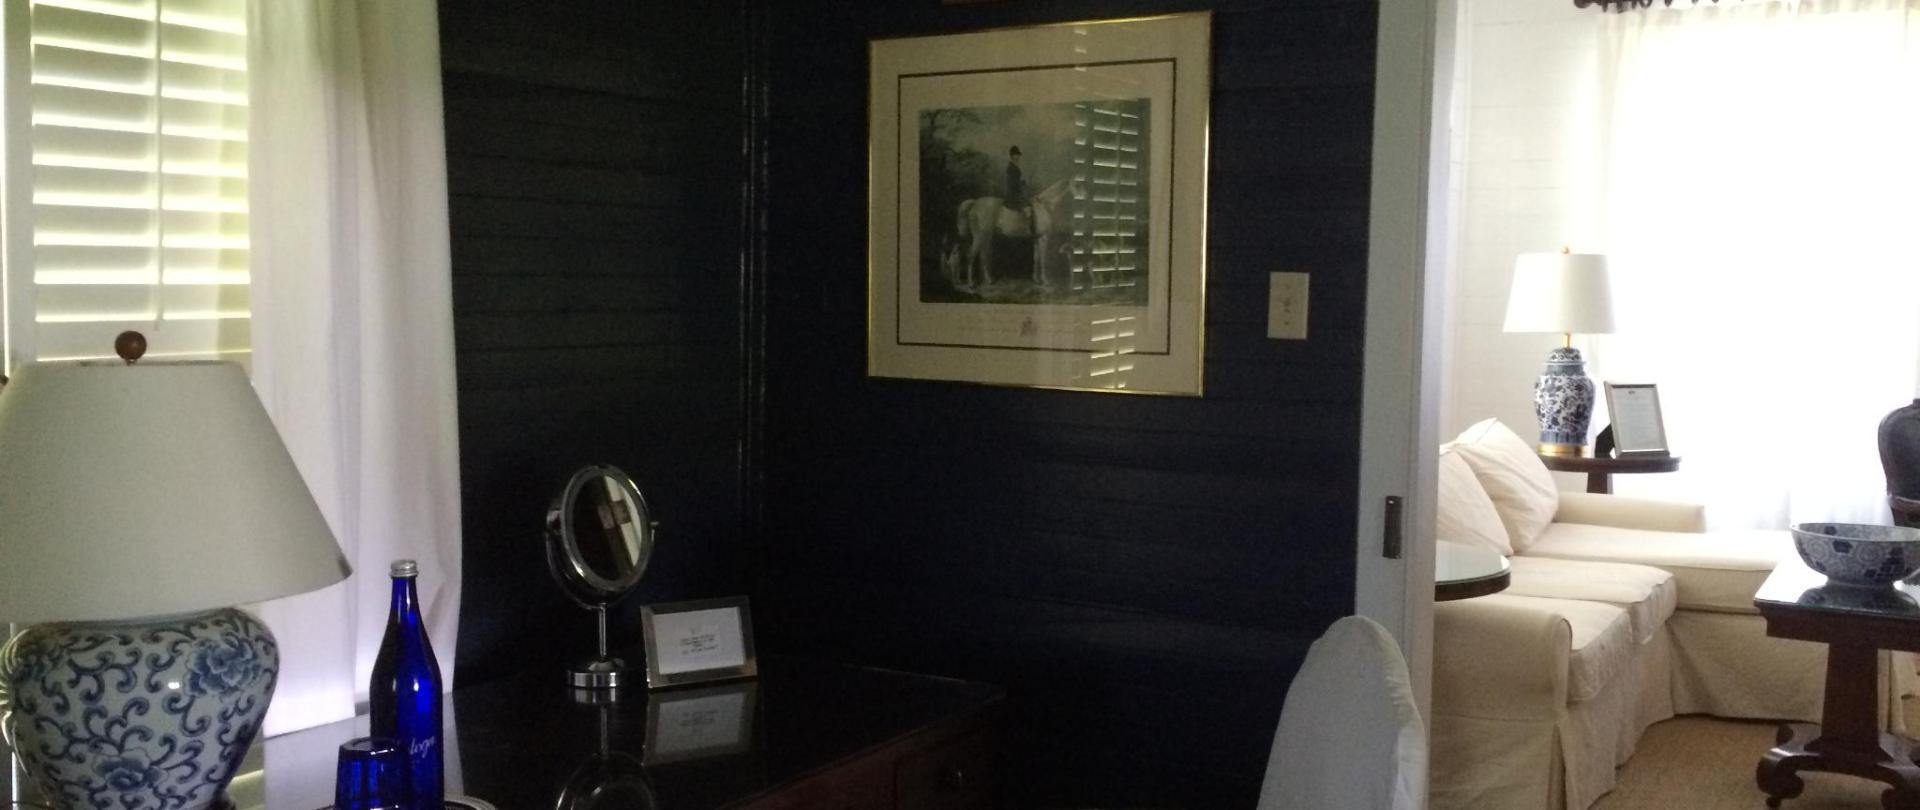 farmhouse - blue bedroom desk thru living room.jpg